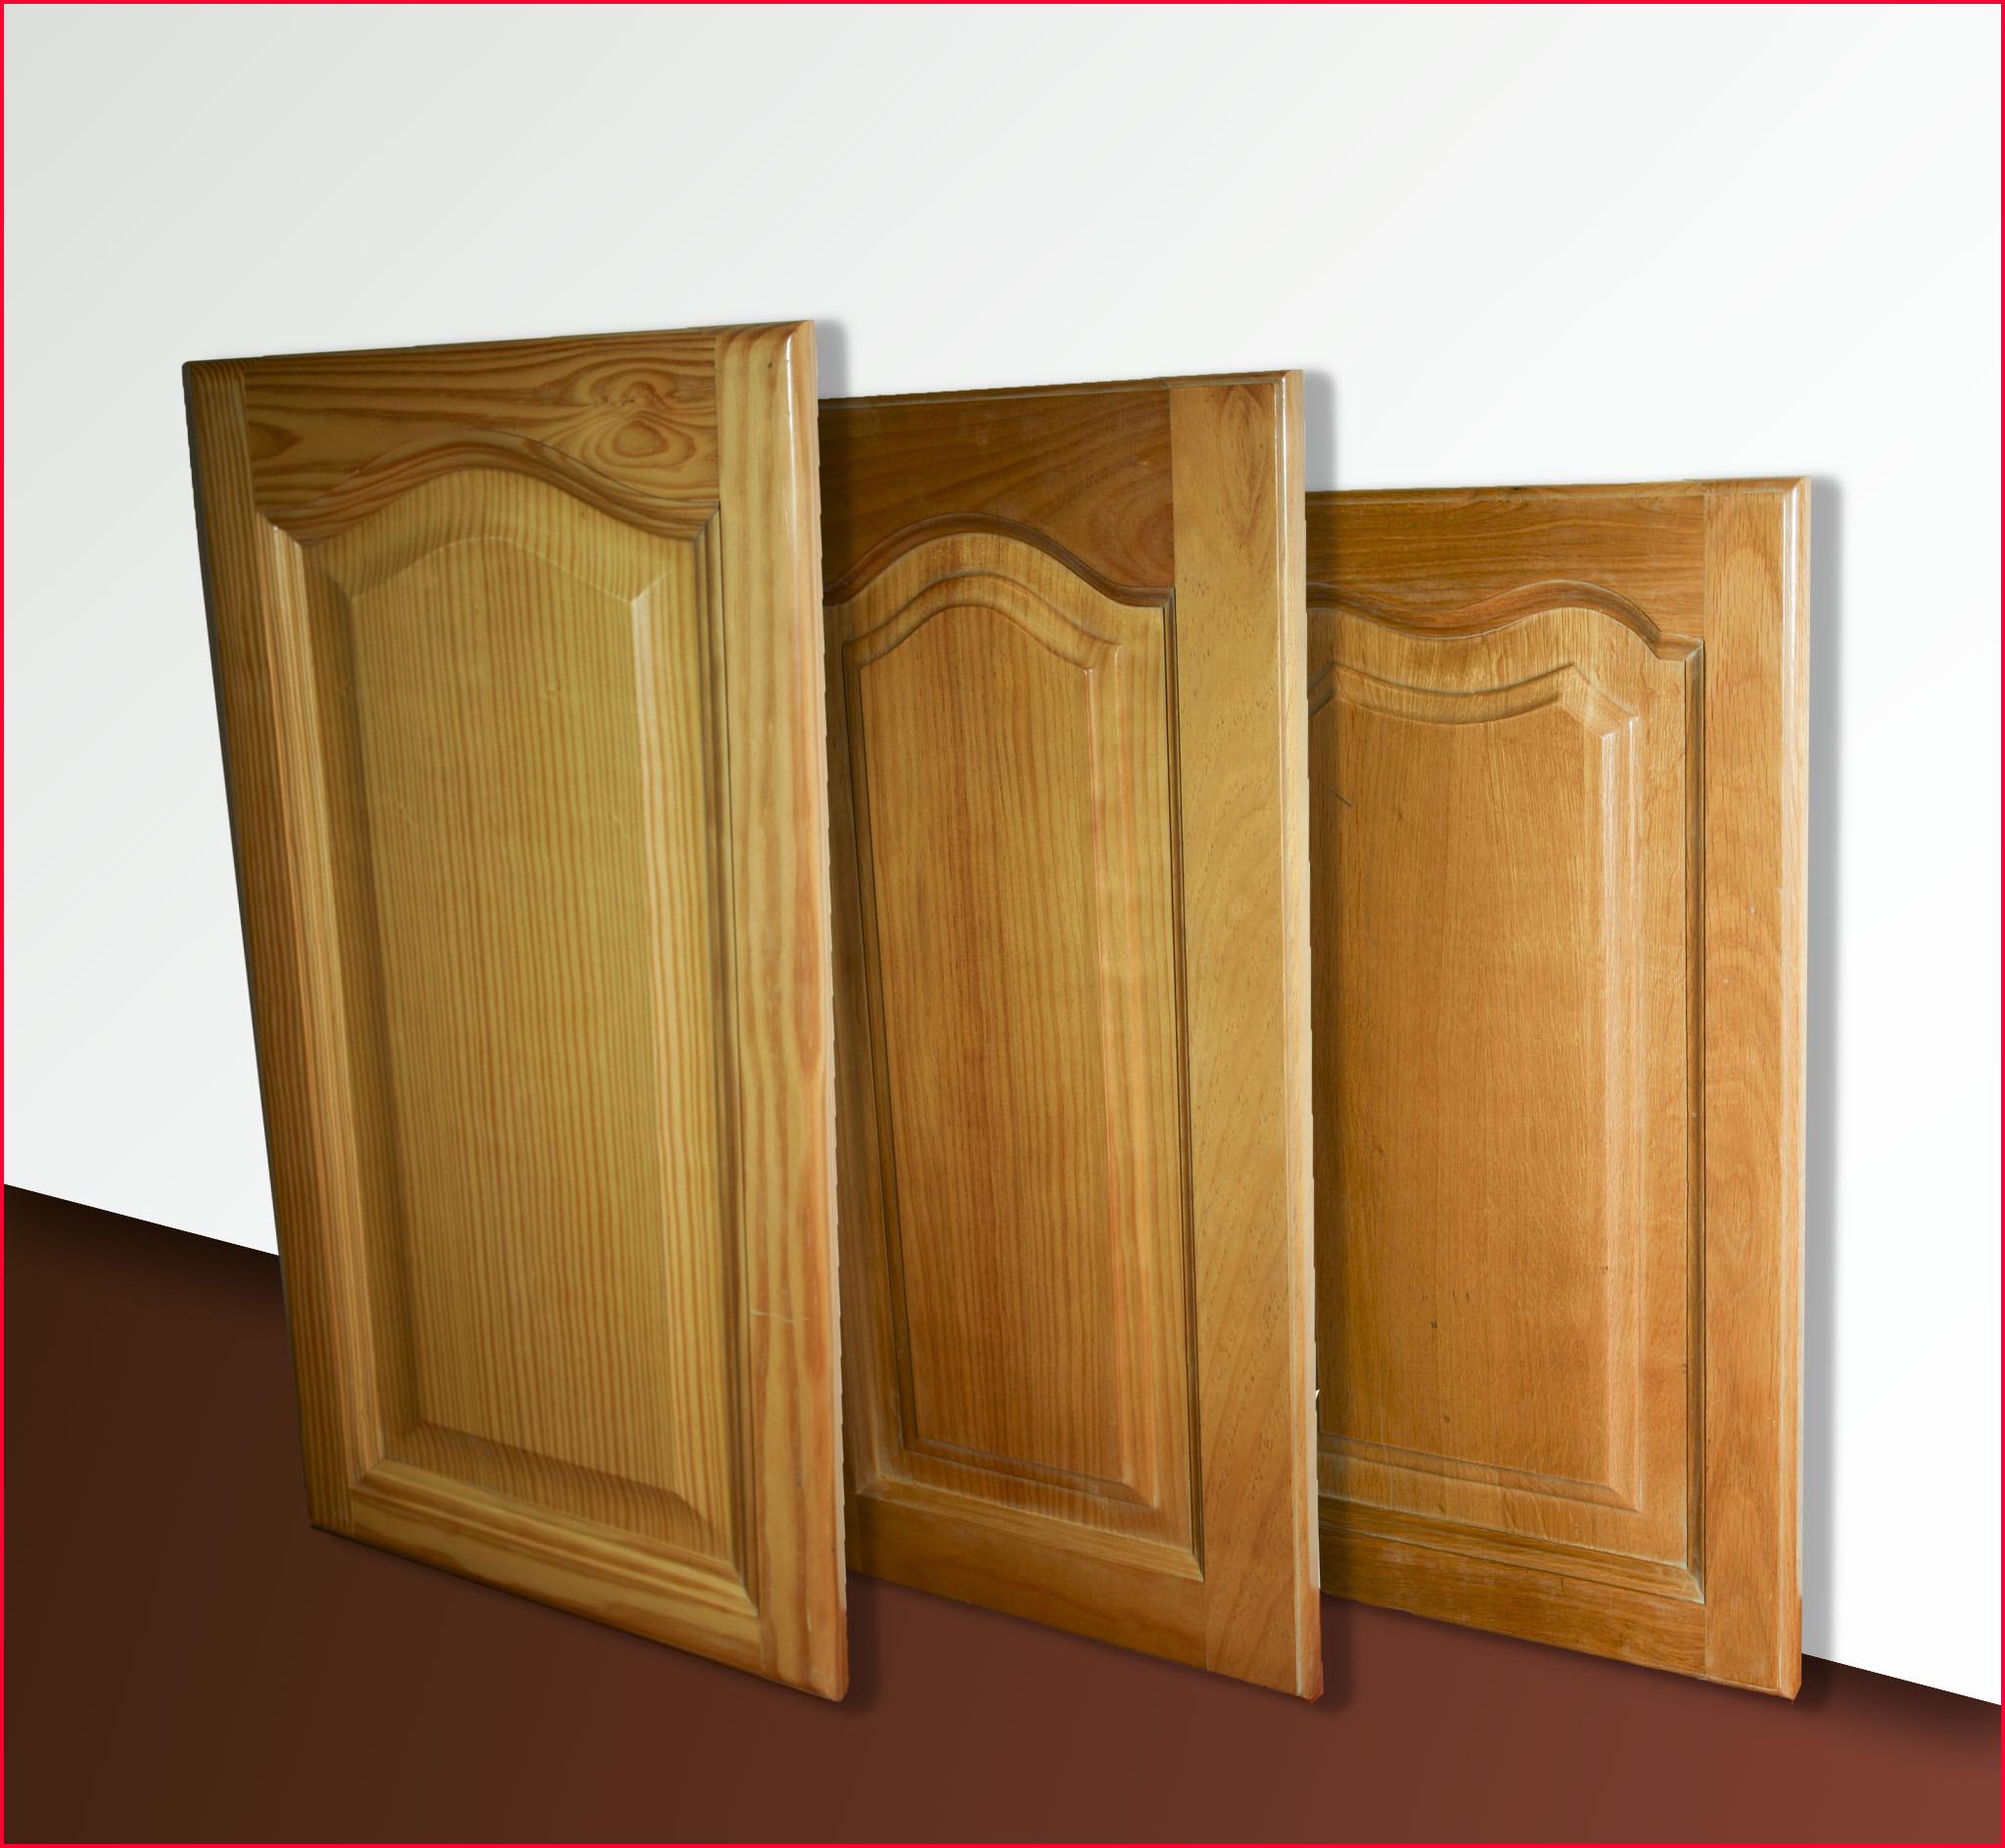 Puertas De Muebles De Cocina X8d1 Puertas Muebles Cocina Muebles De Cocina Decoracià N